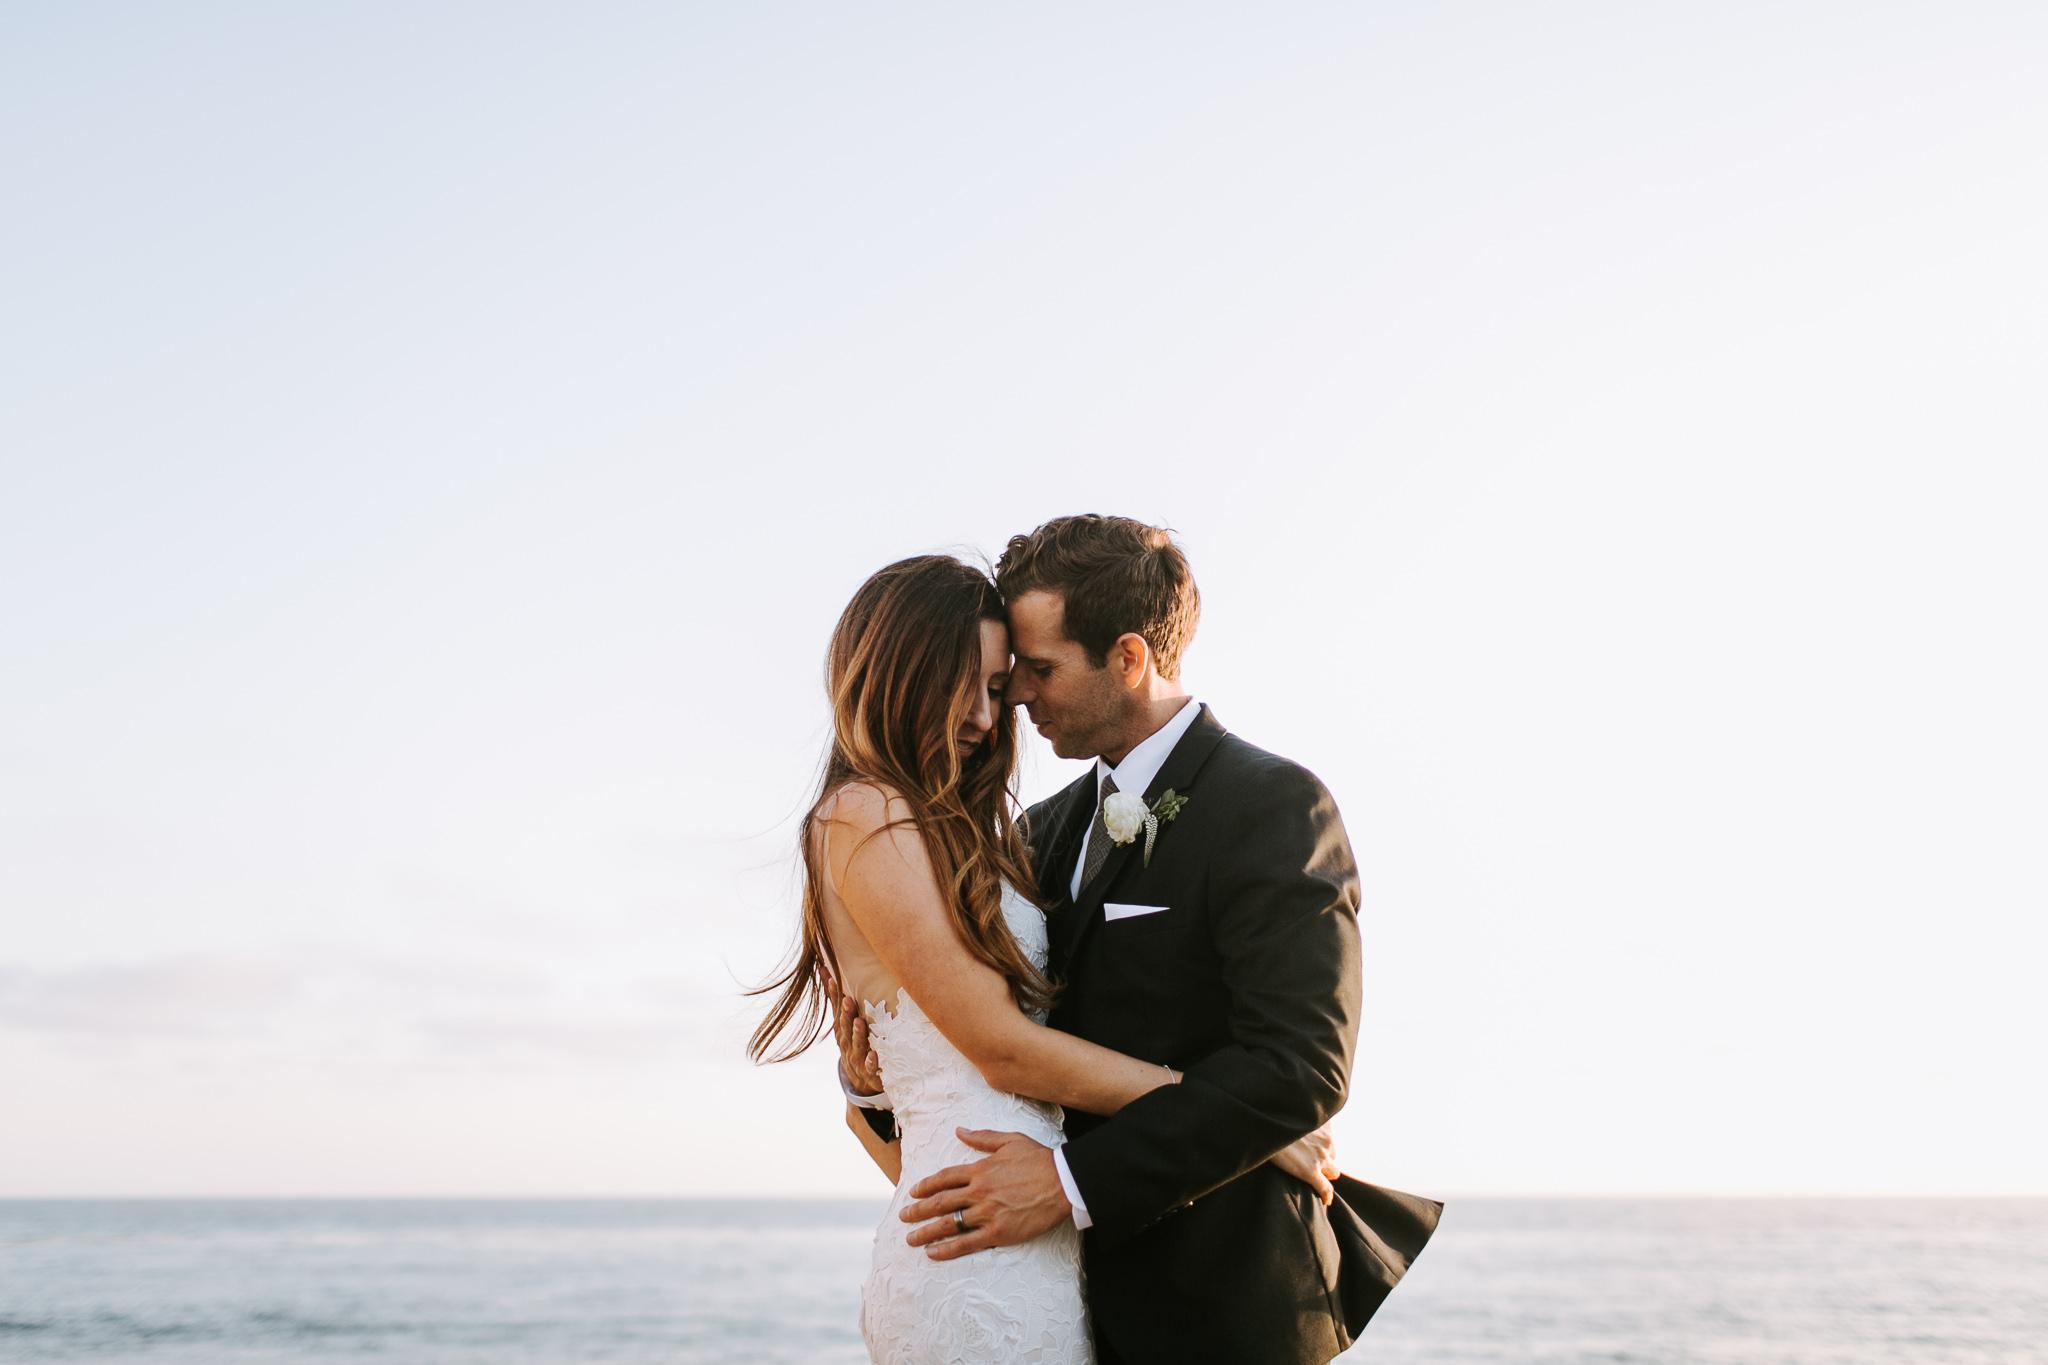 LagunaBeach-WeddingPhotographer-57.jpg